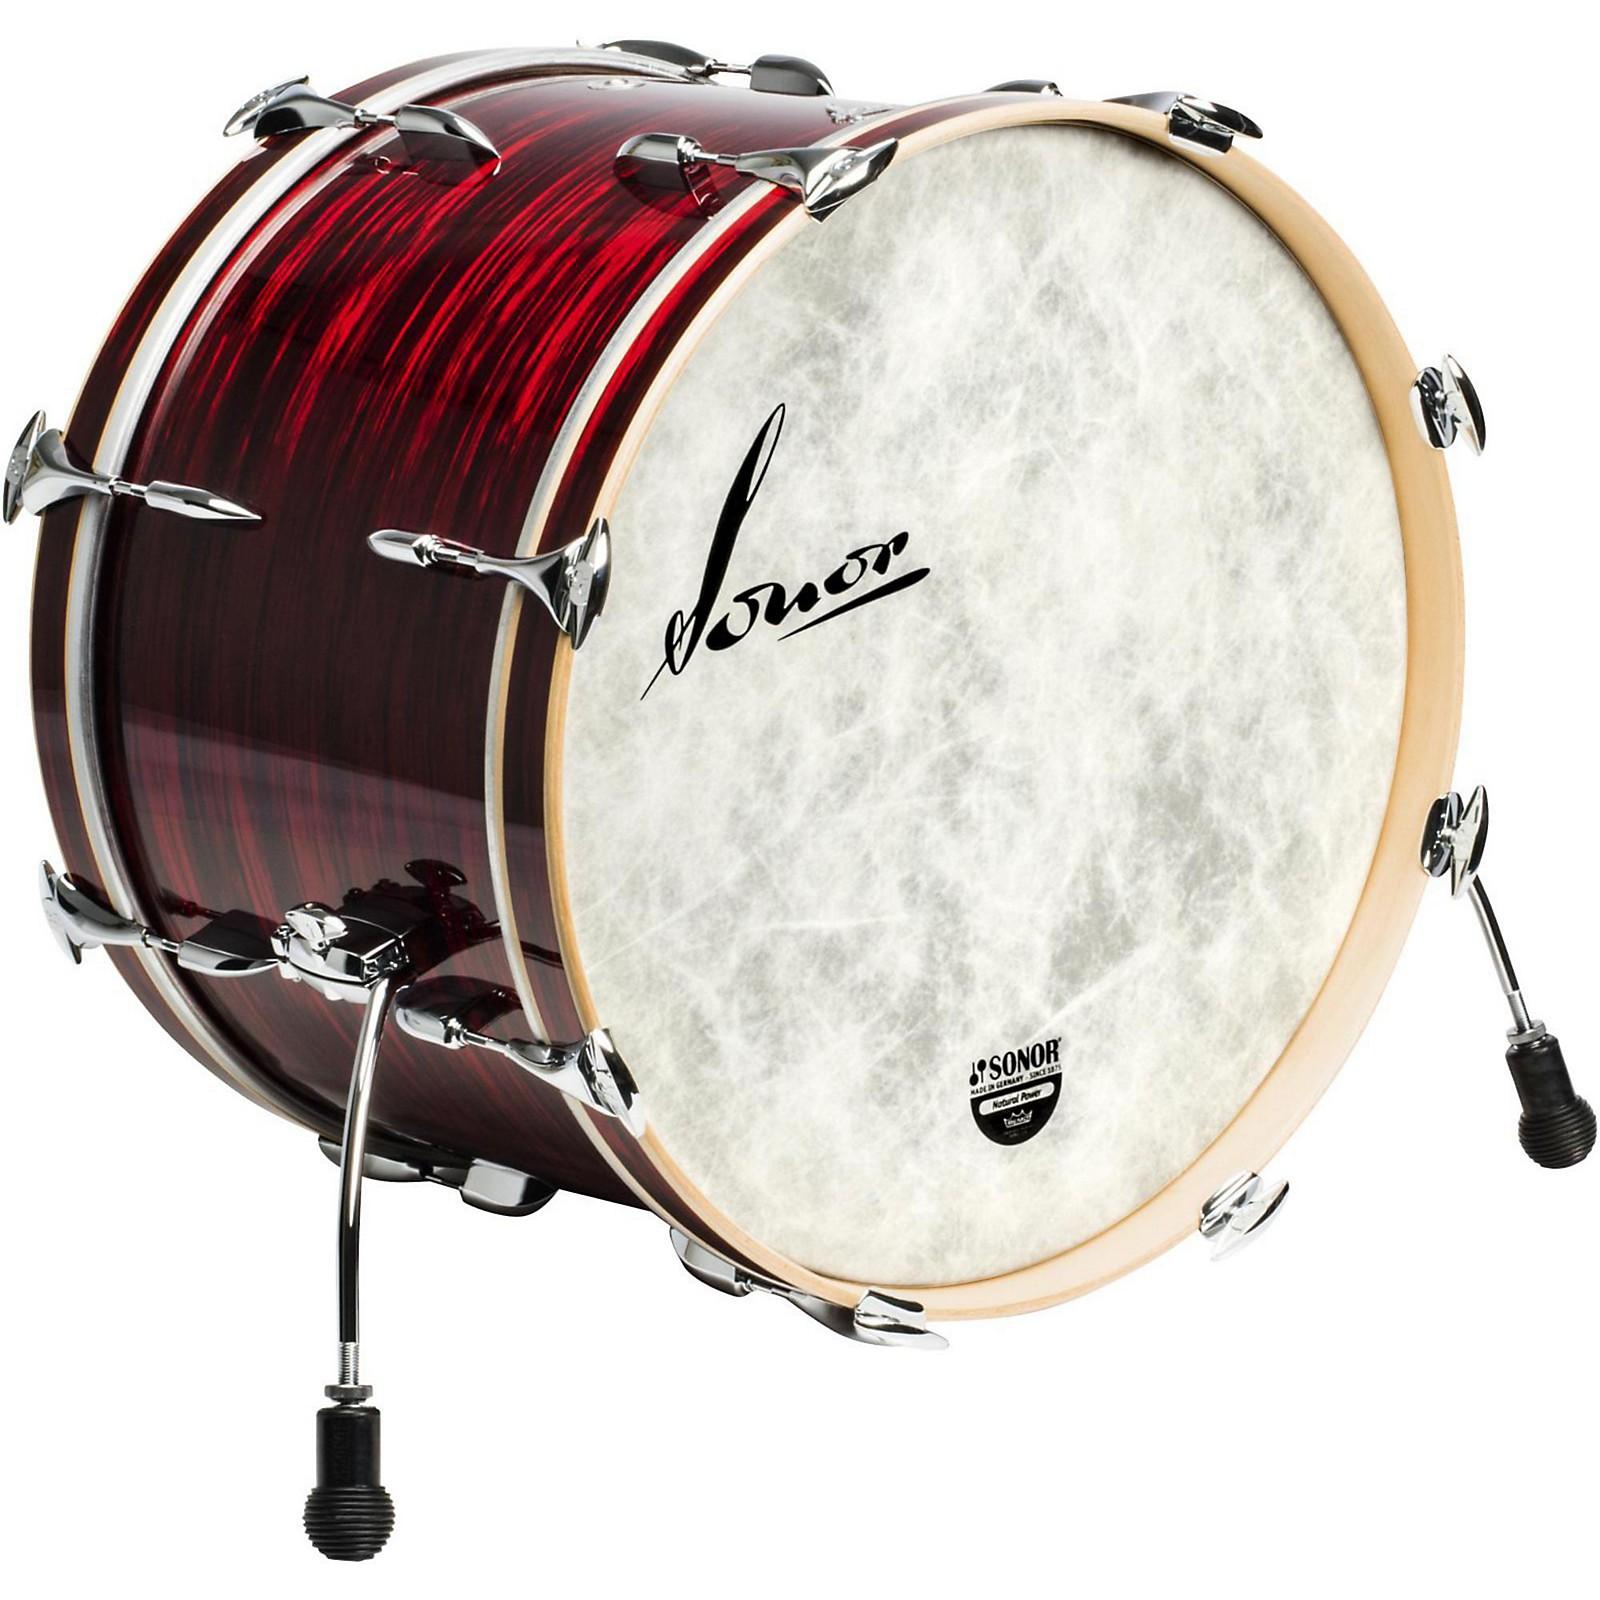 Sonor Vintage Series Bass Drum